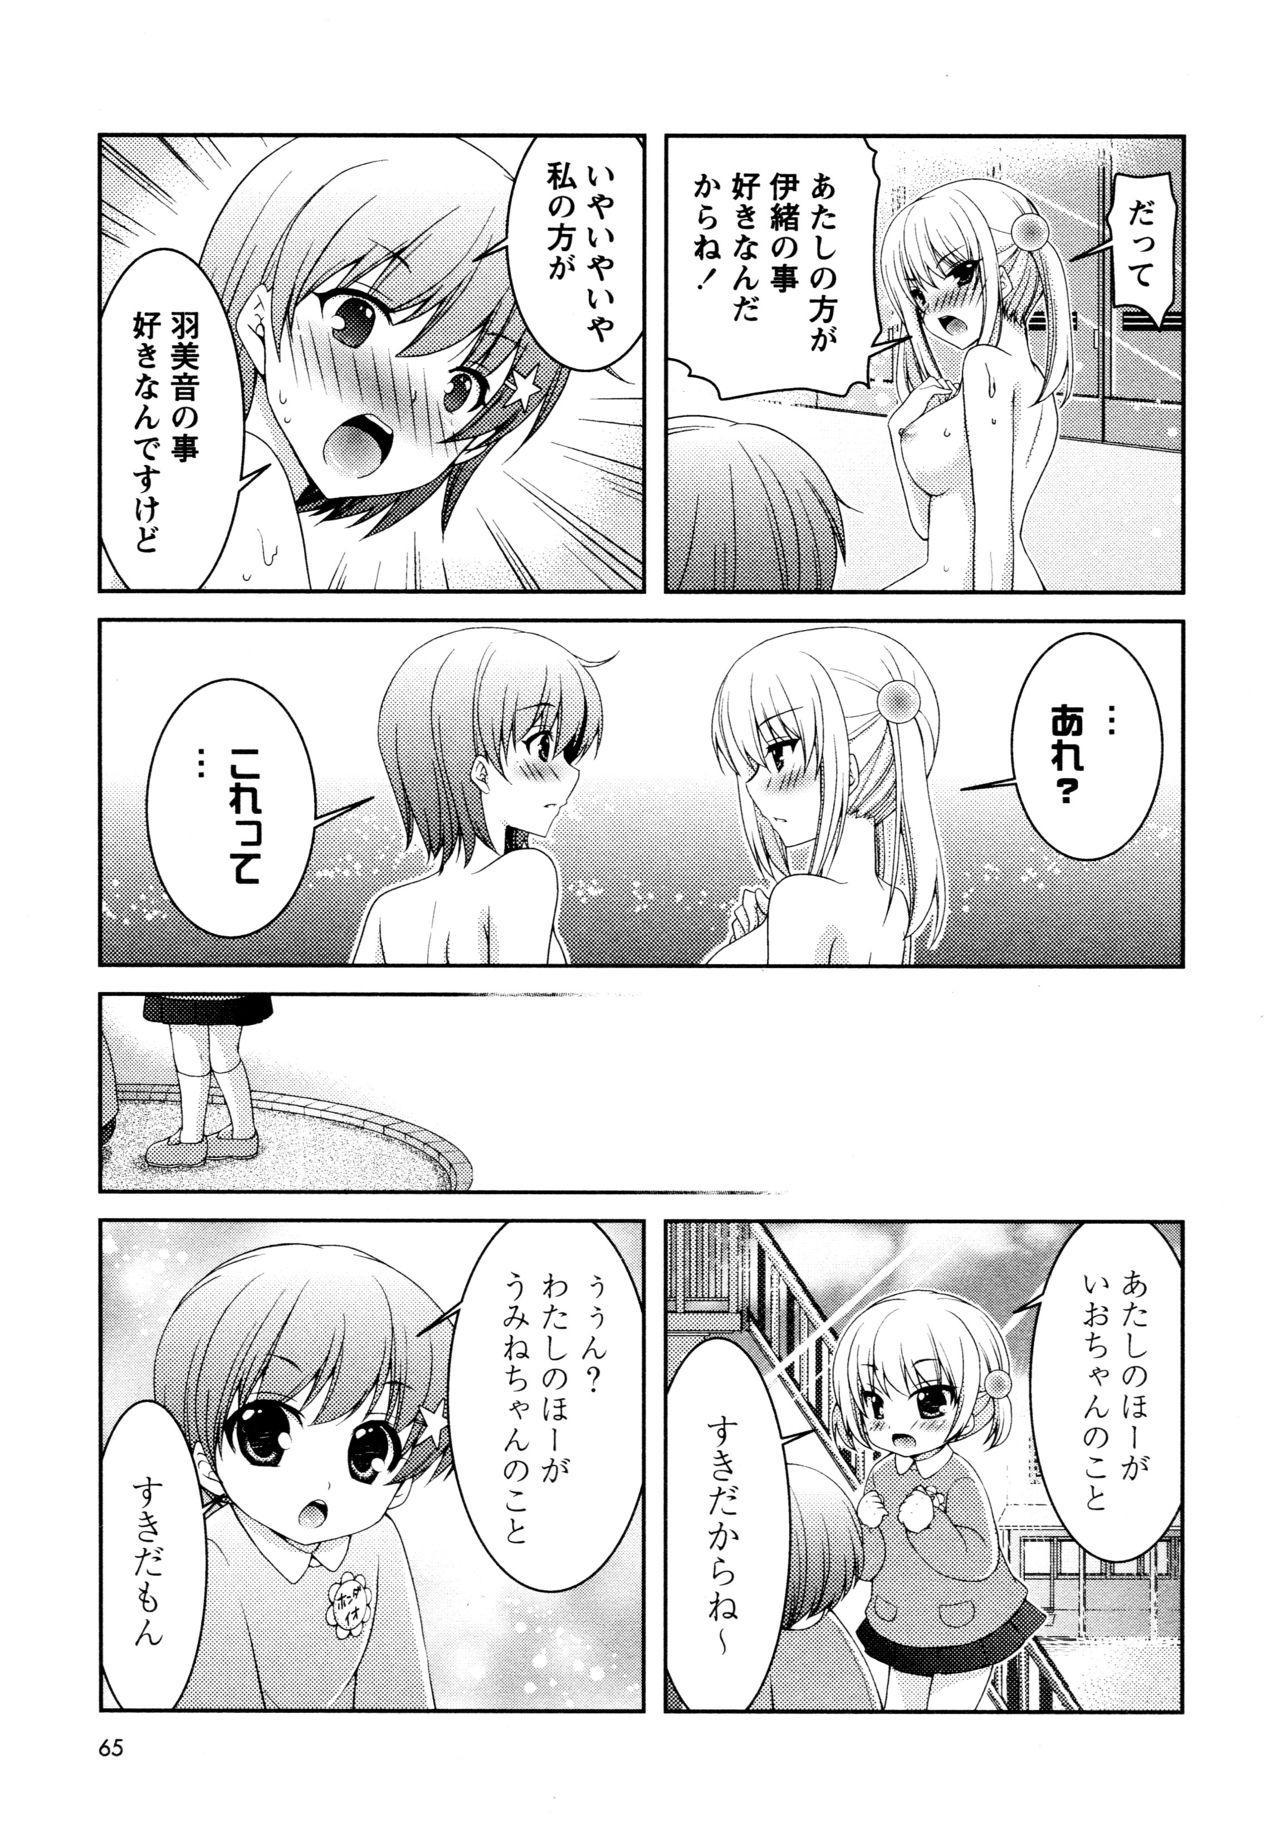 [Anthology] L Girls -Love Girls- 05 66